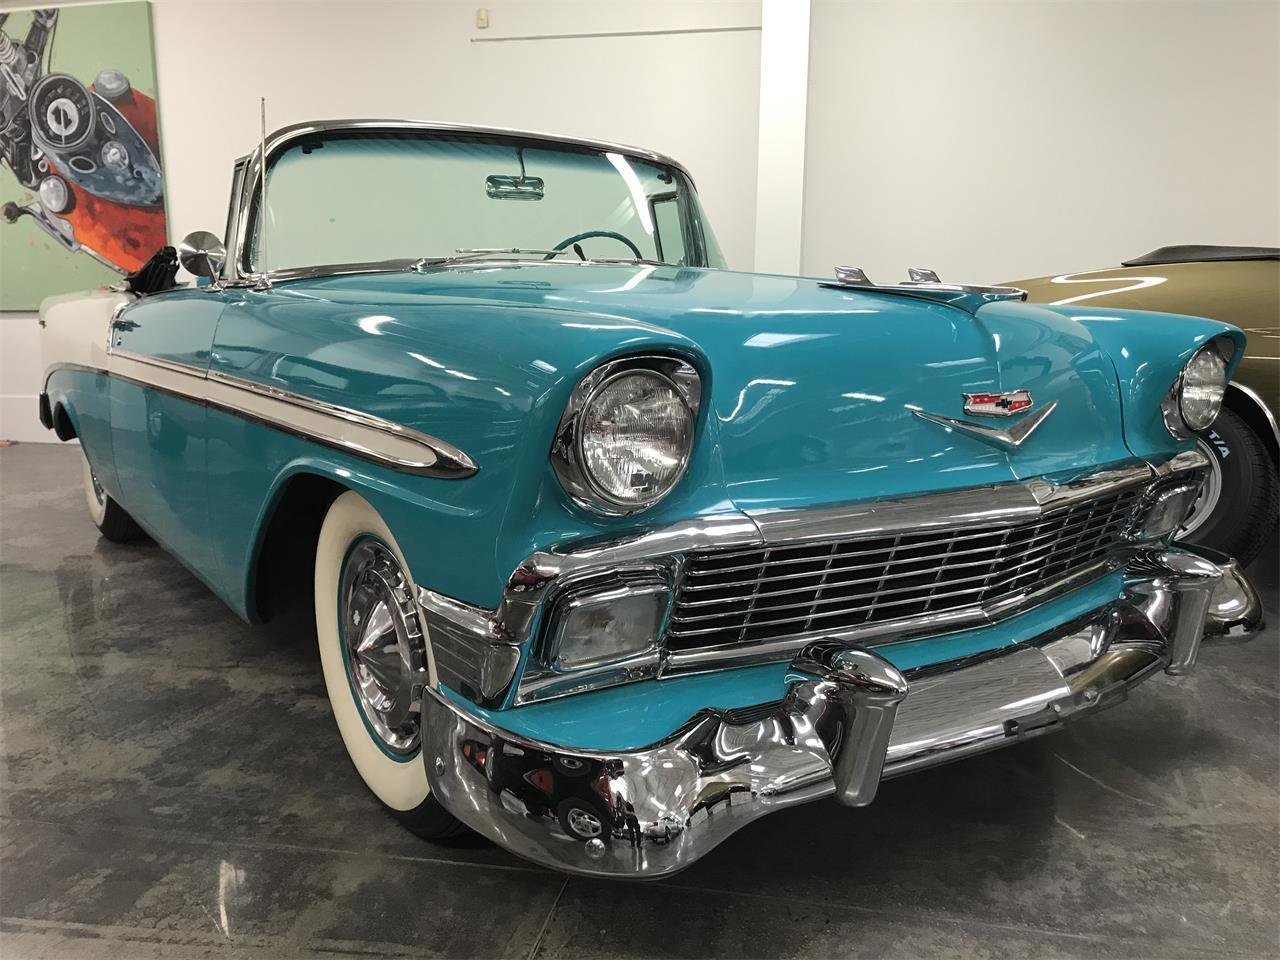 Peachy For Sale 1956 Chevrolet Bel Air In West Valley City Utah Beutiful Home Inspiration Semekurdistantinfo